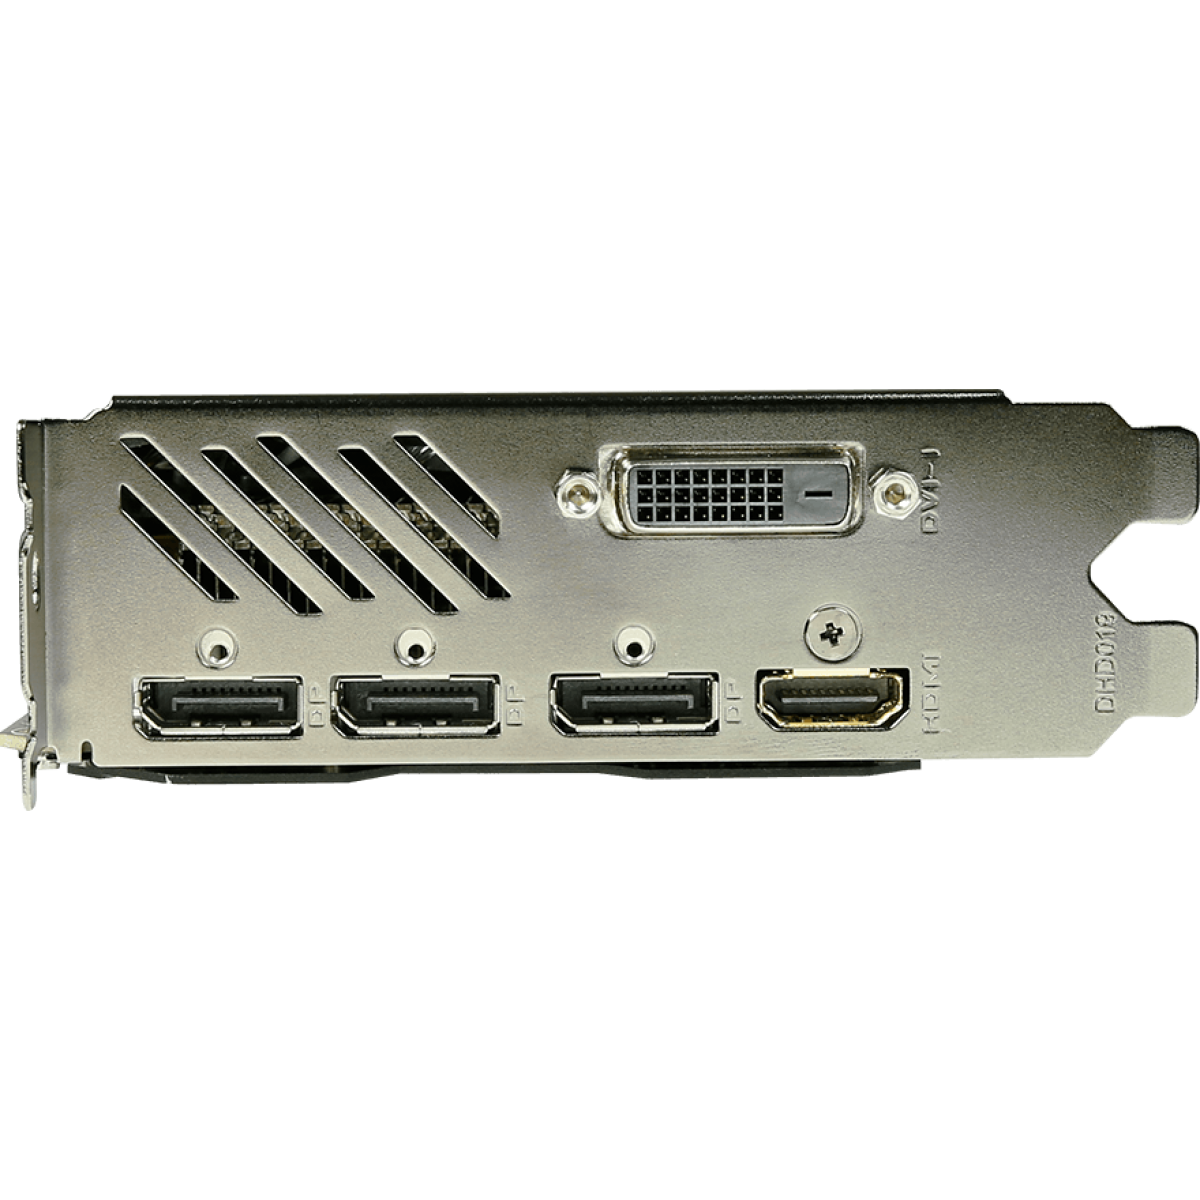 Placa de Vídeo Gigabyte Radeon RX 580 Gaming Dual, 4GB GDDR5, 256Bit, GV-RX580GAMING-4GD